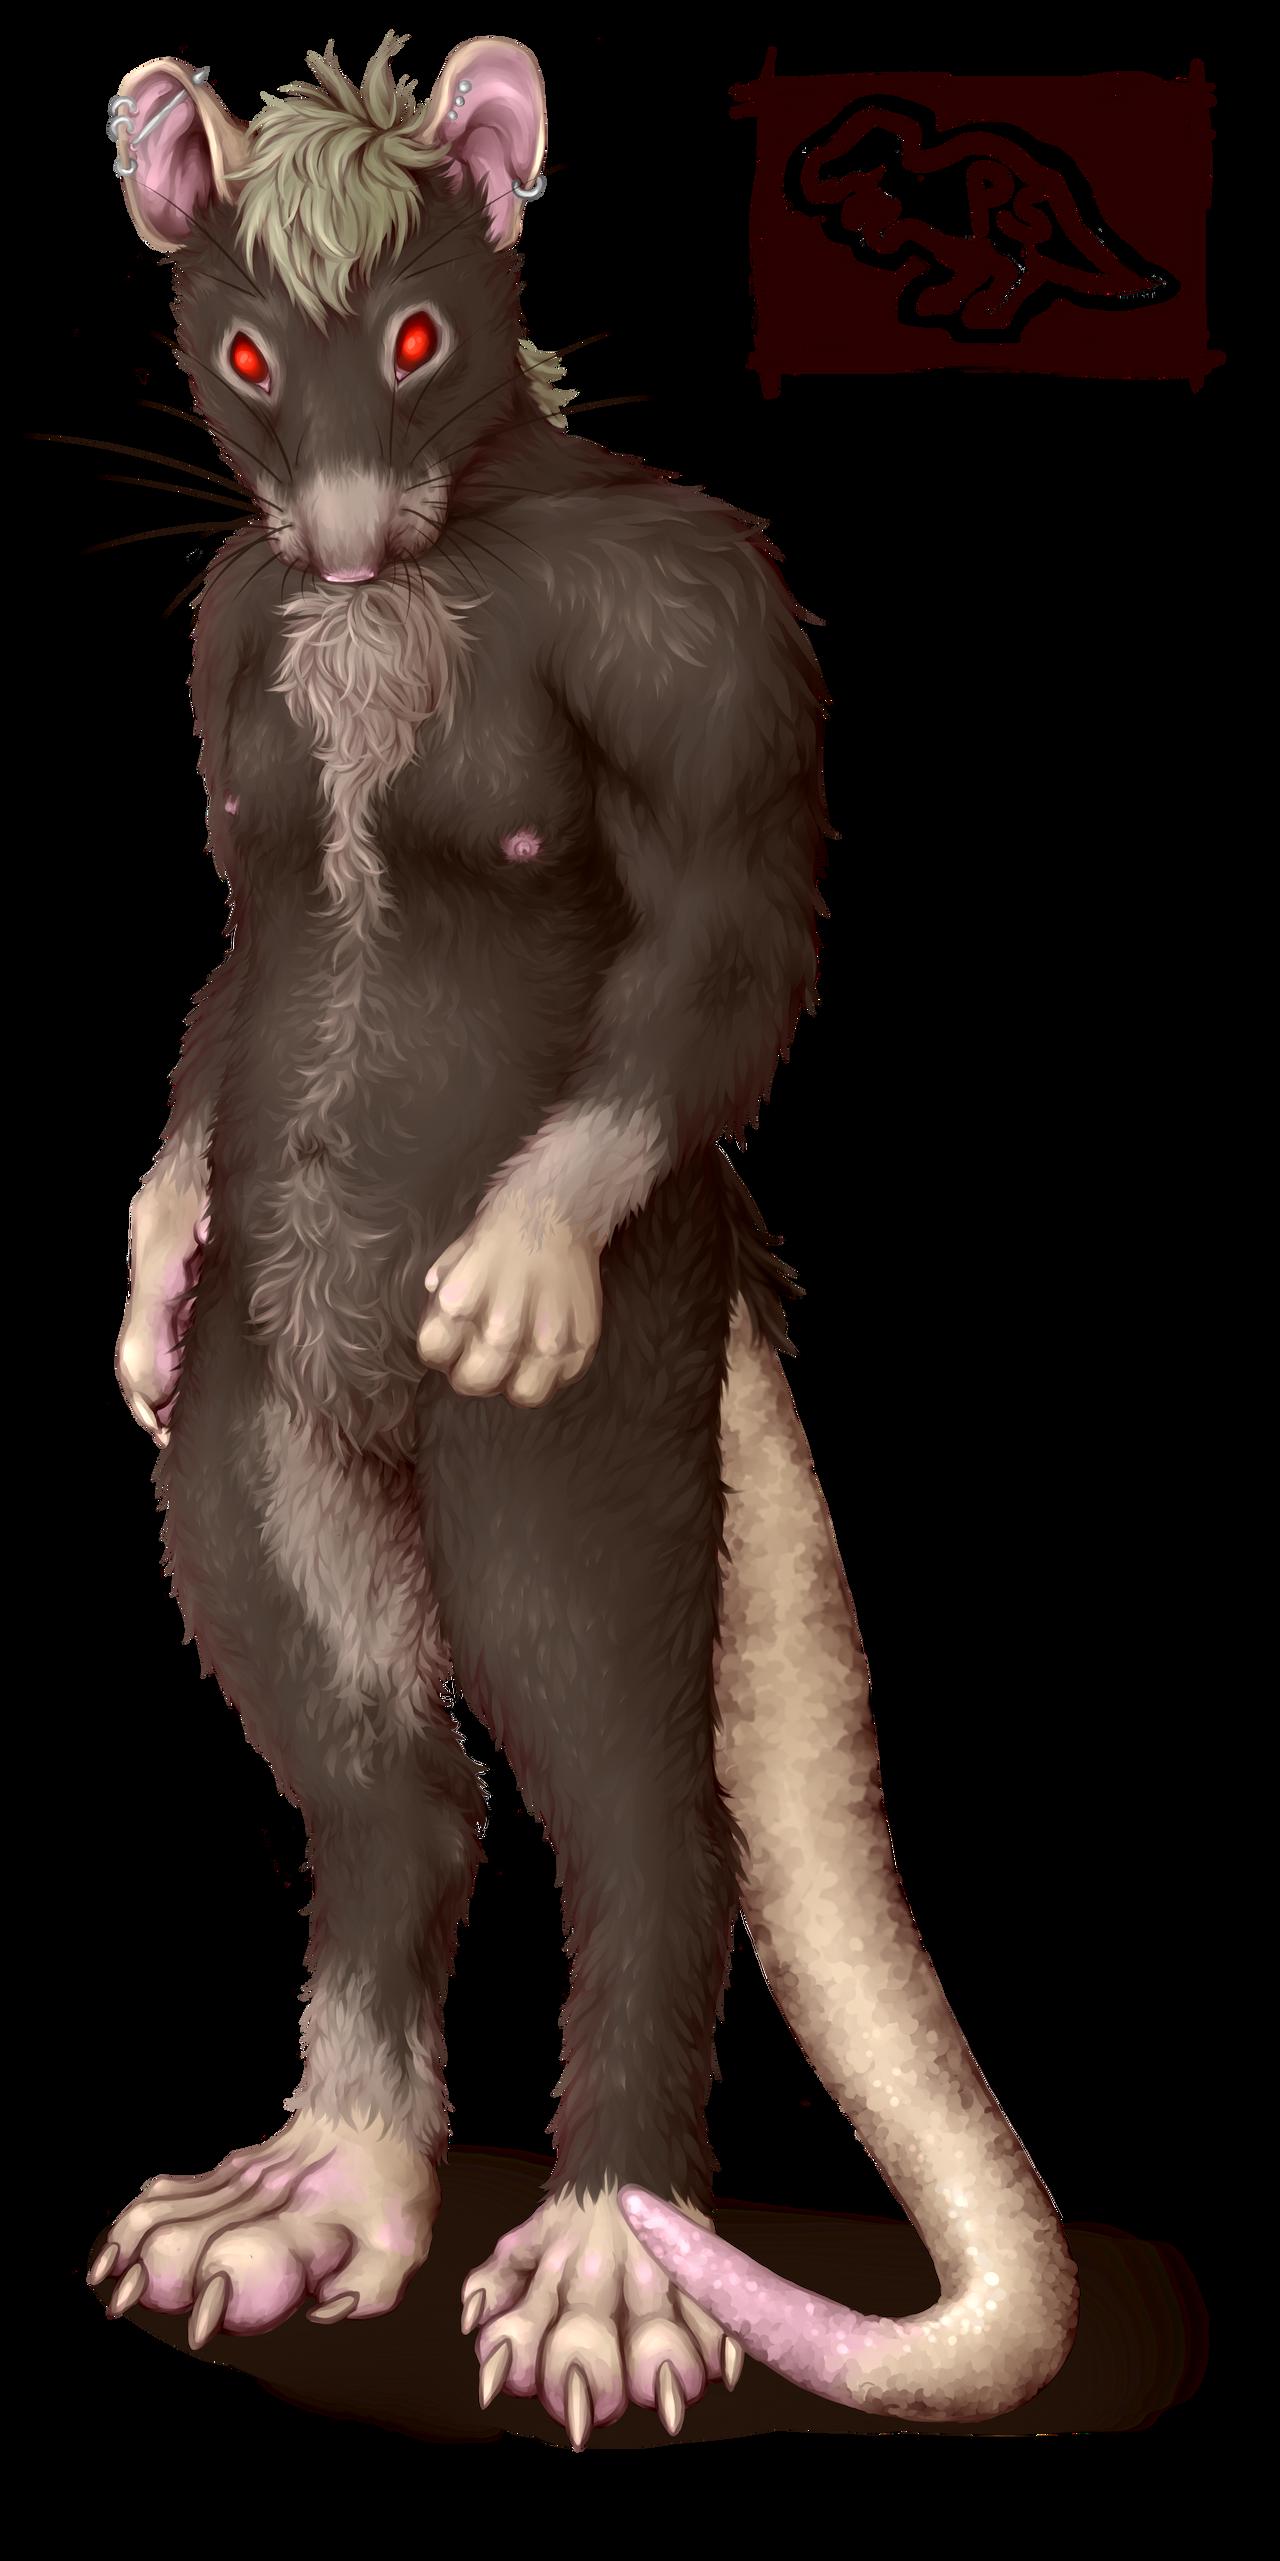 Ratman 'naked' study - sort of